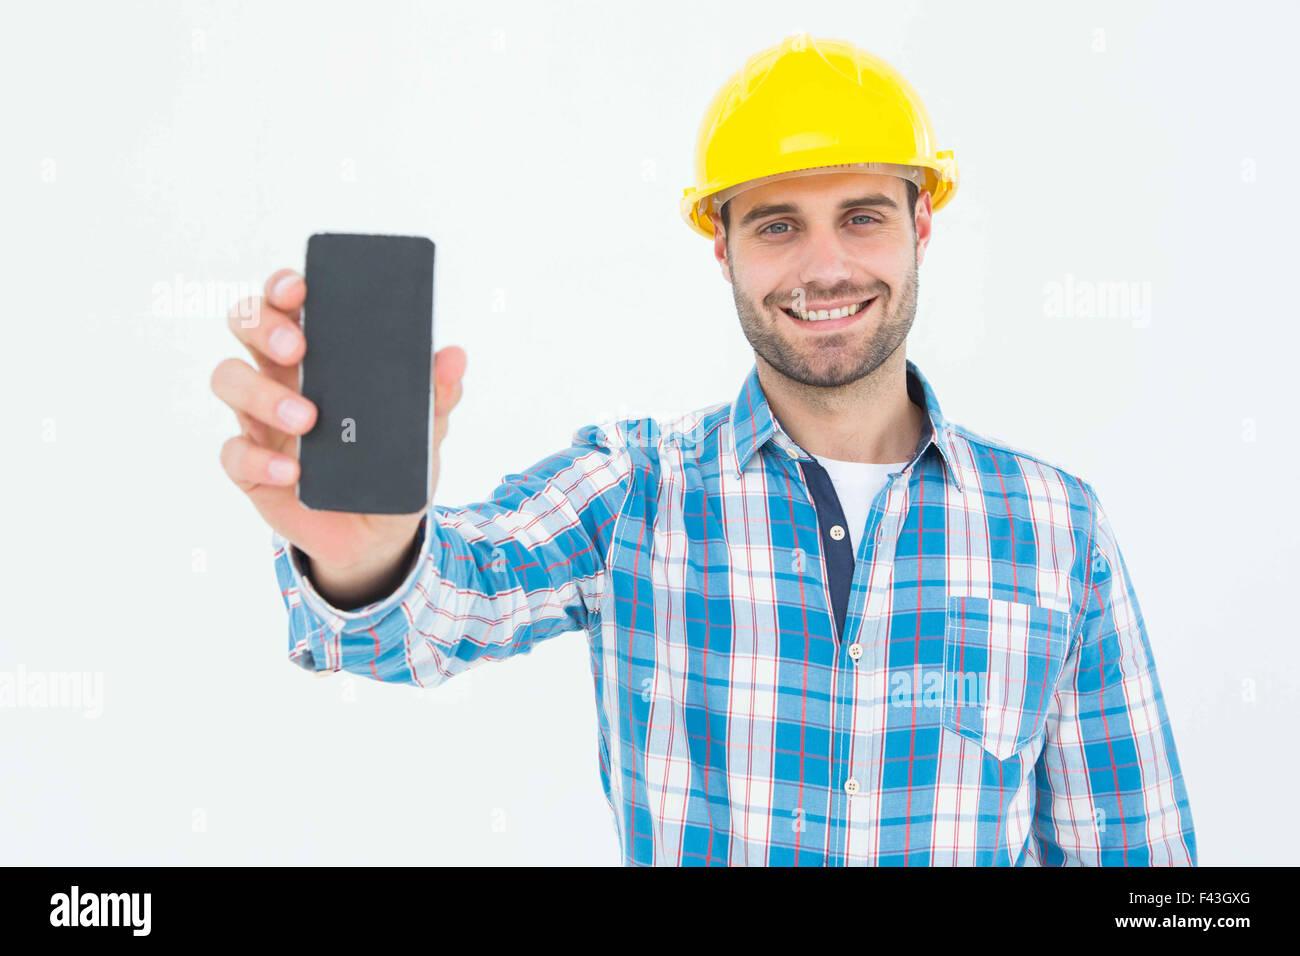 happy construction worker showing smart phone stock photo royalty happy construction worker showing smart phone